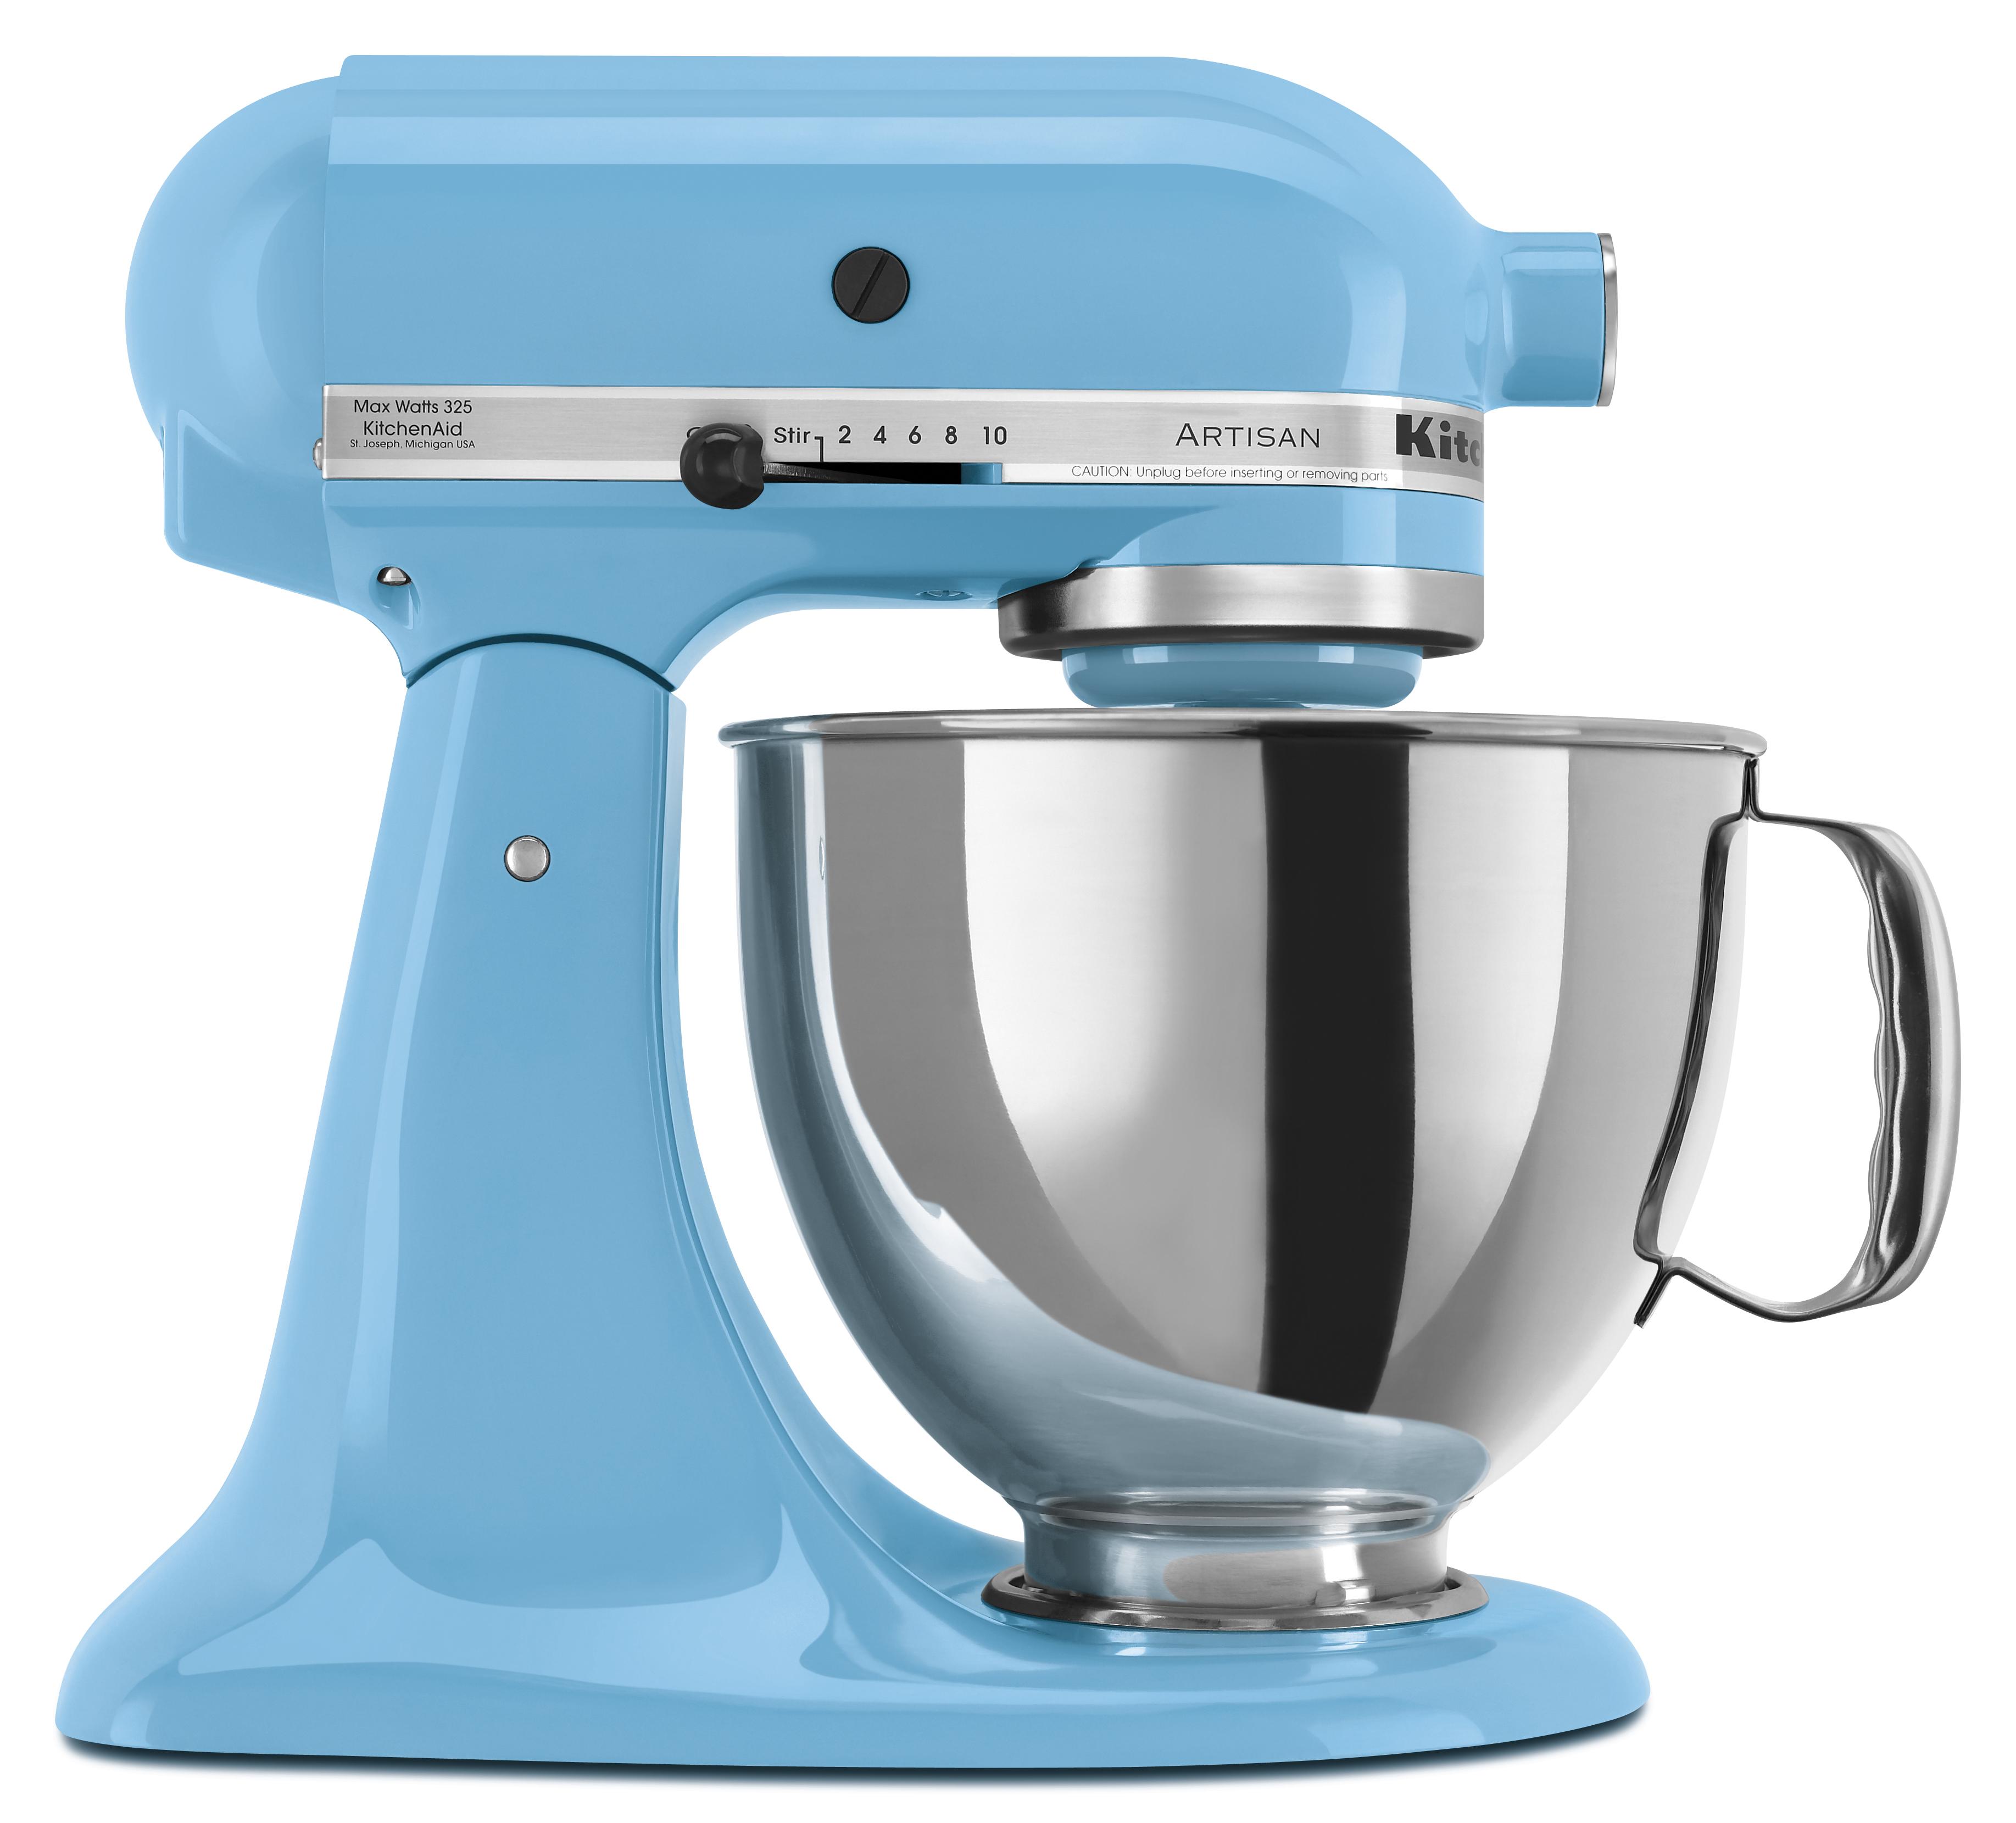 Kitchenaid mixer ice cream maker photo - 1